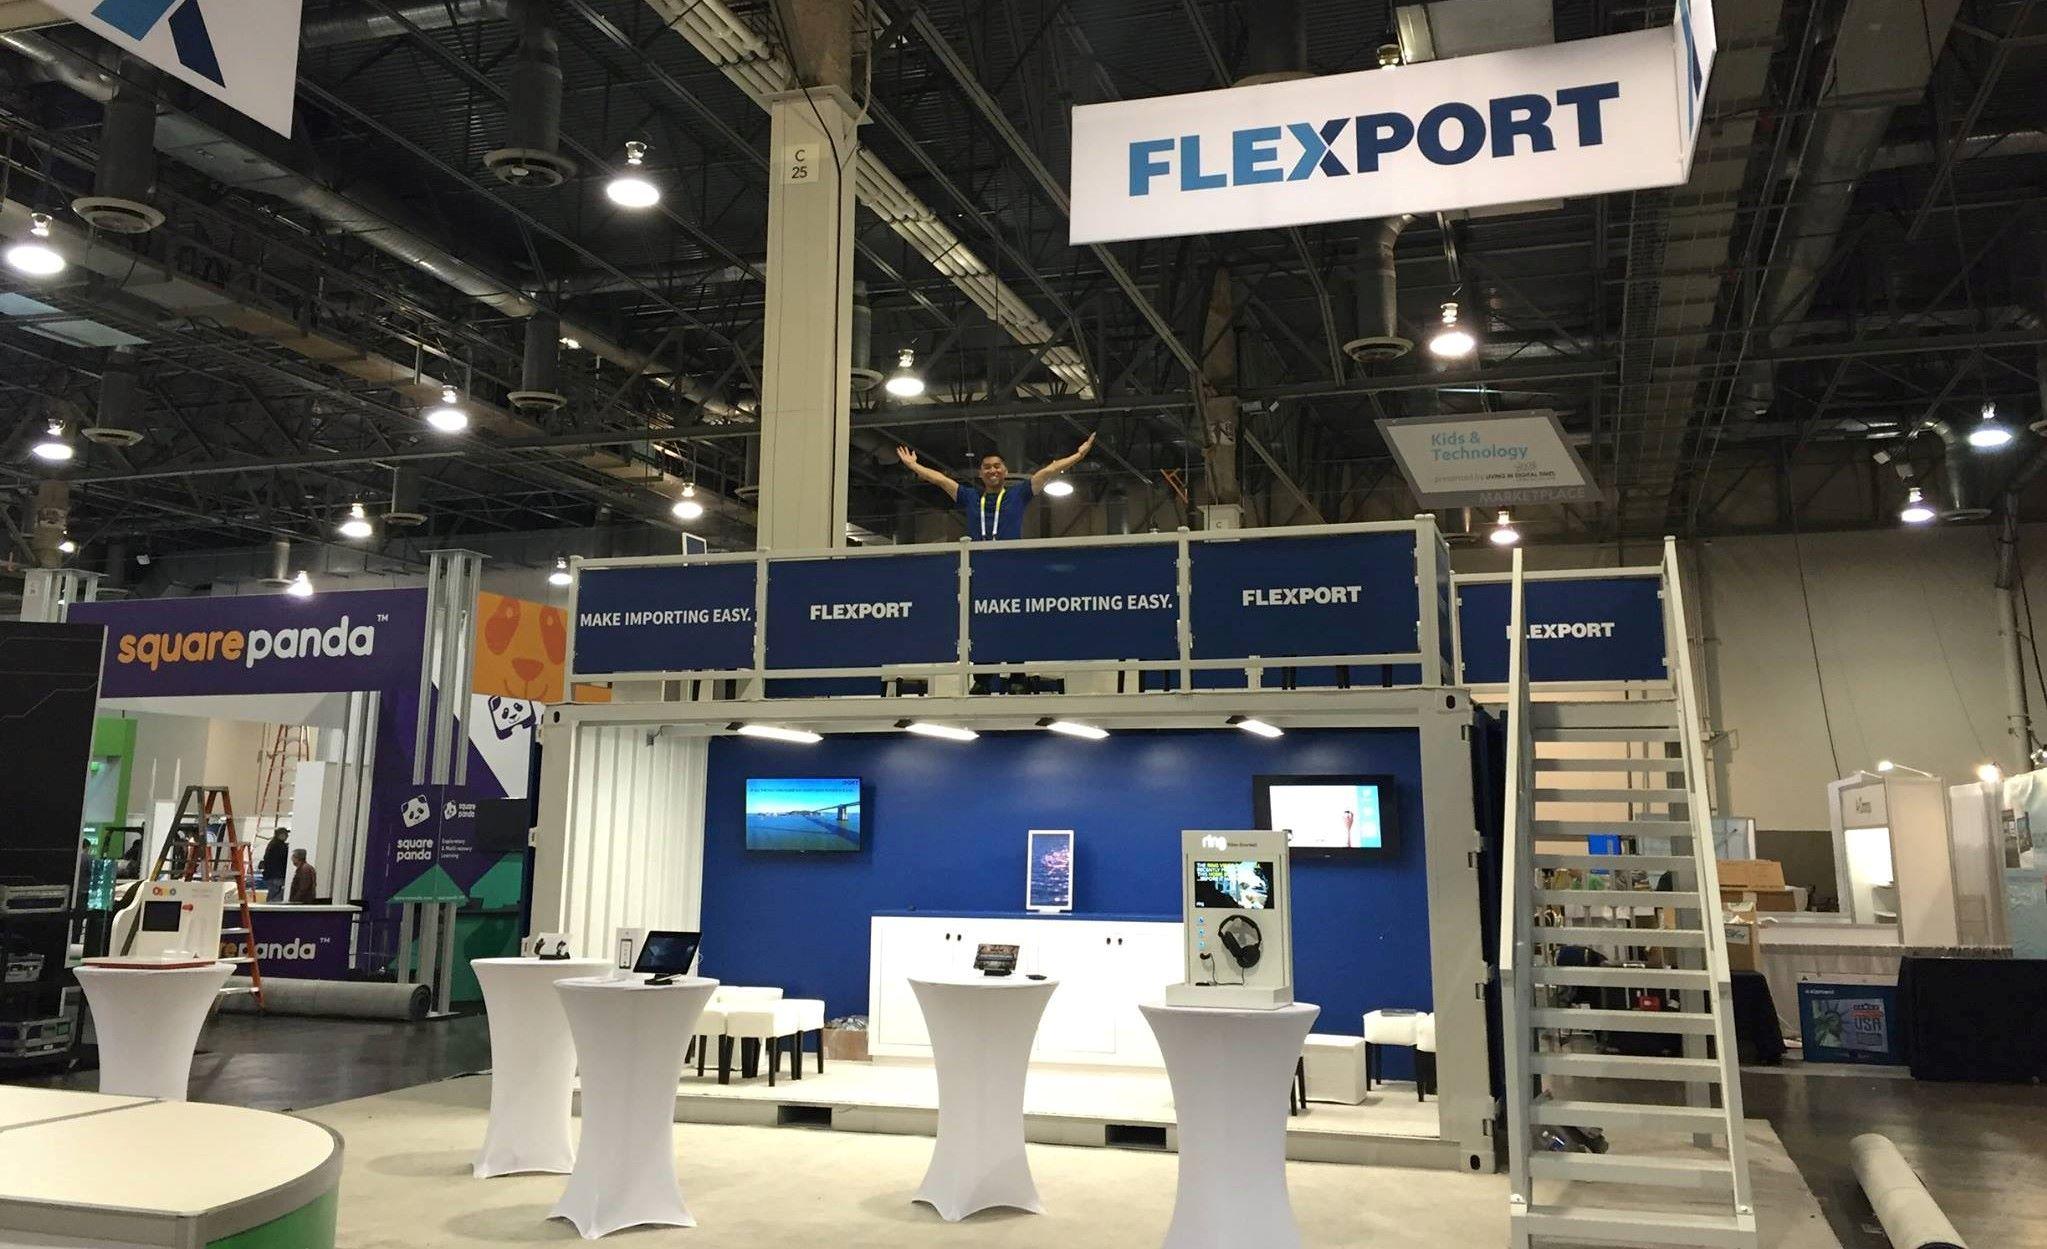 Flexport staff at the tradeshow